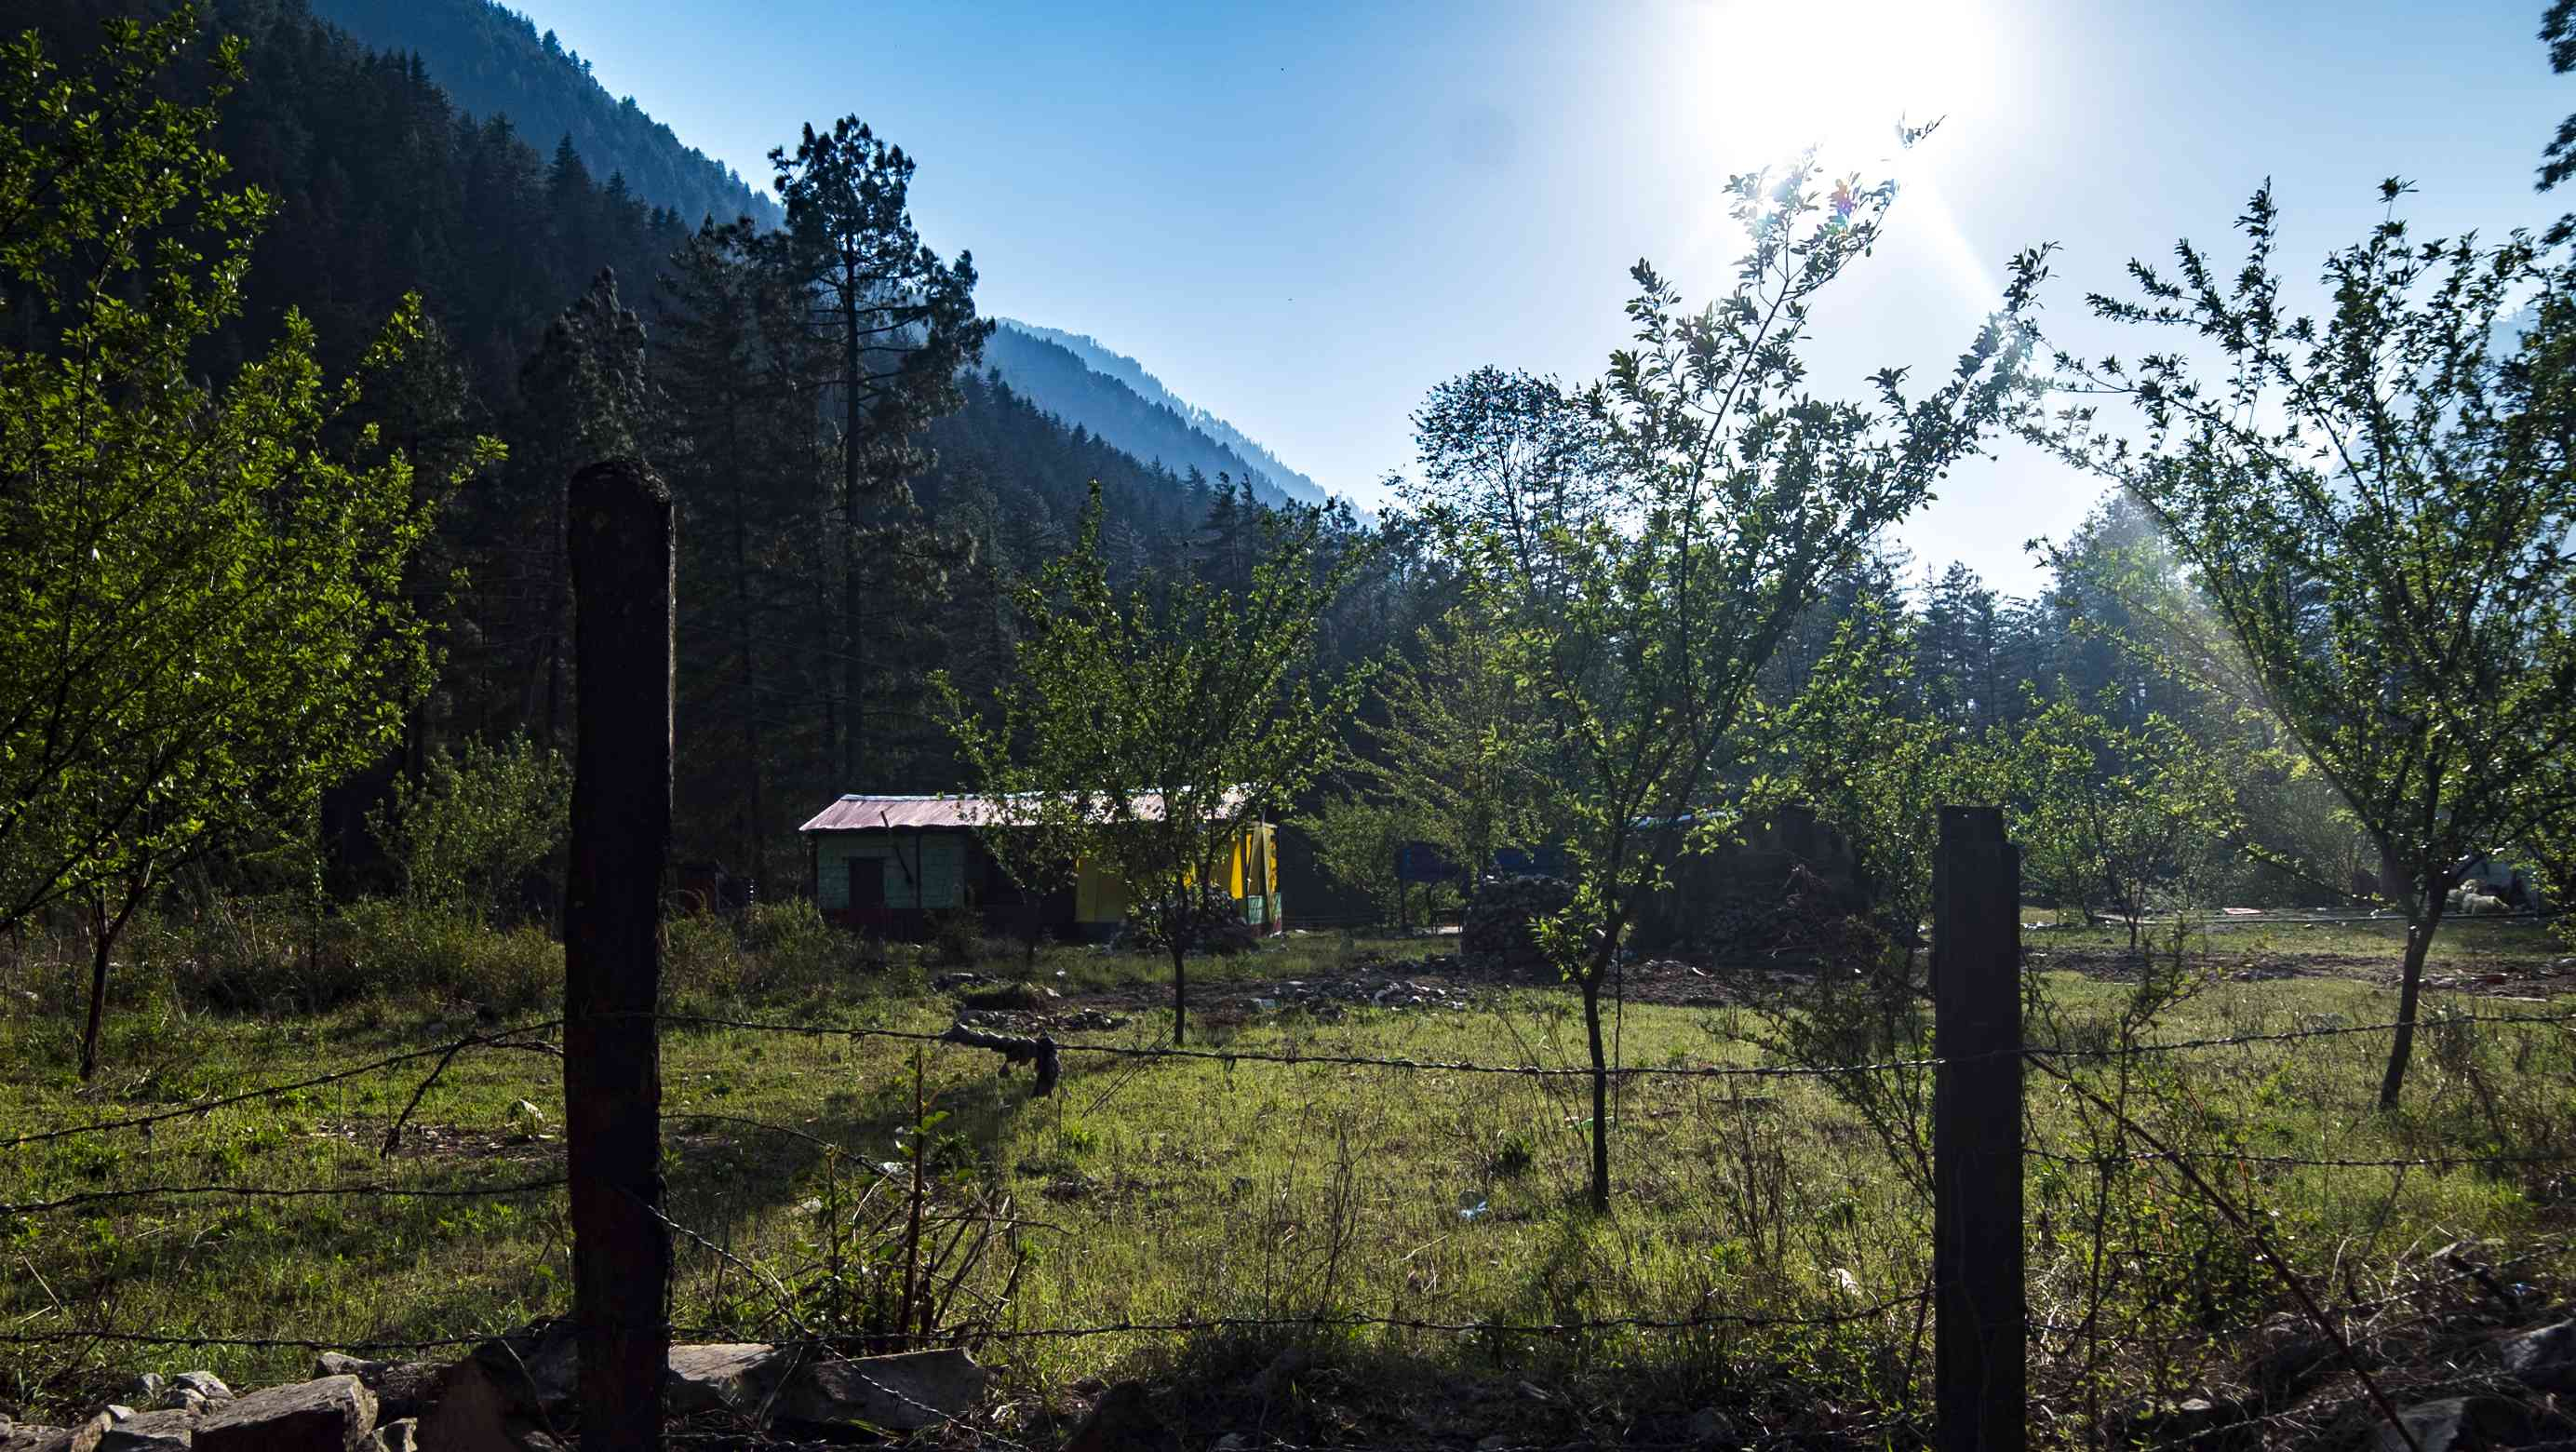 Chalal village life - Himachal Pradesh, India